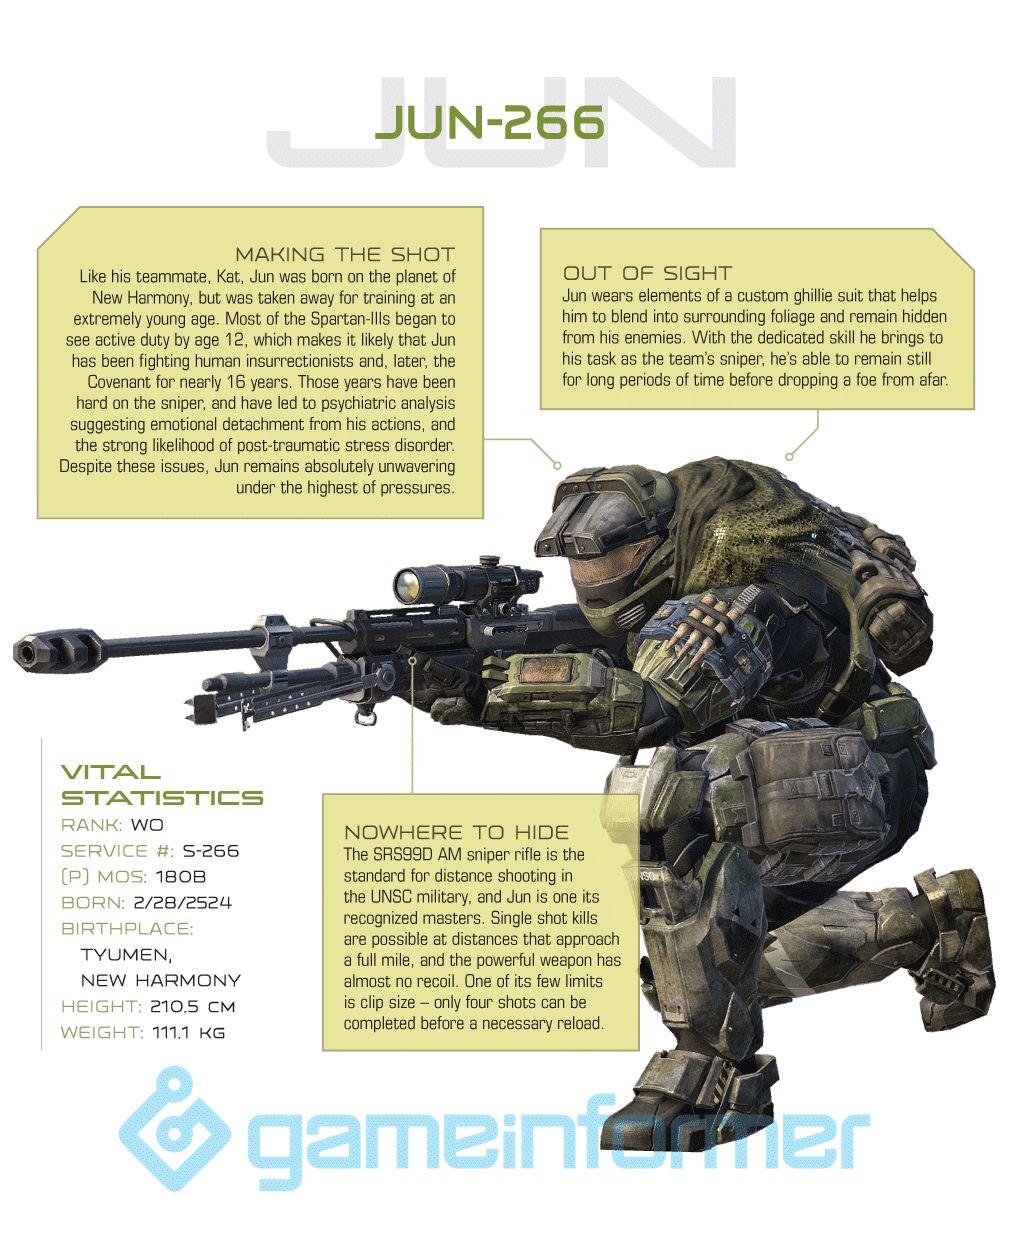 Noble Team - Jun 266